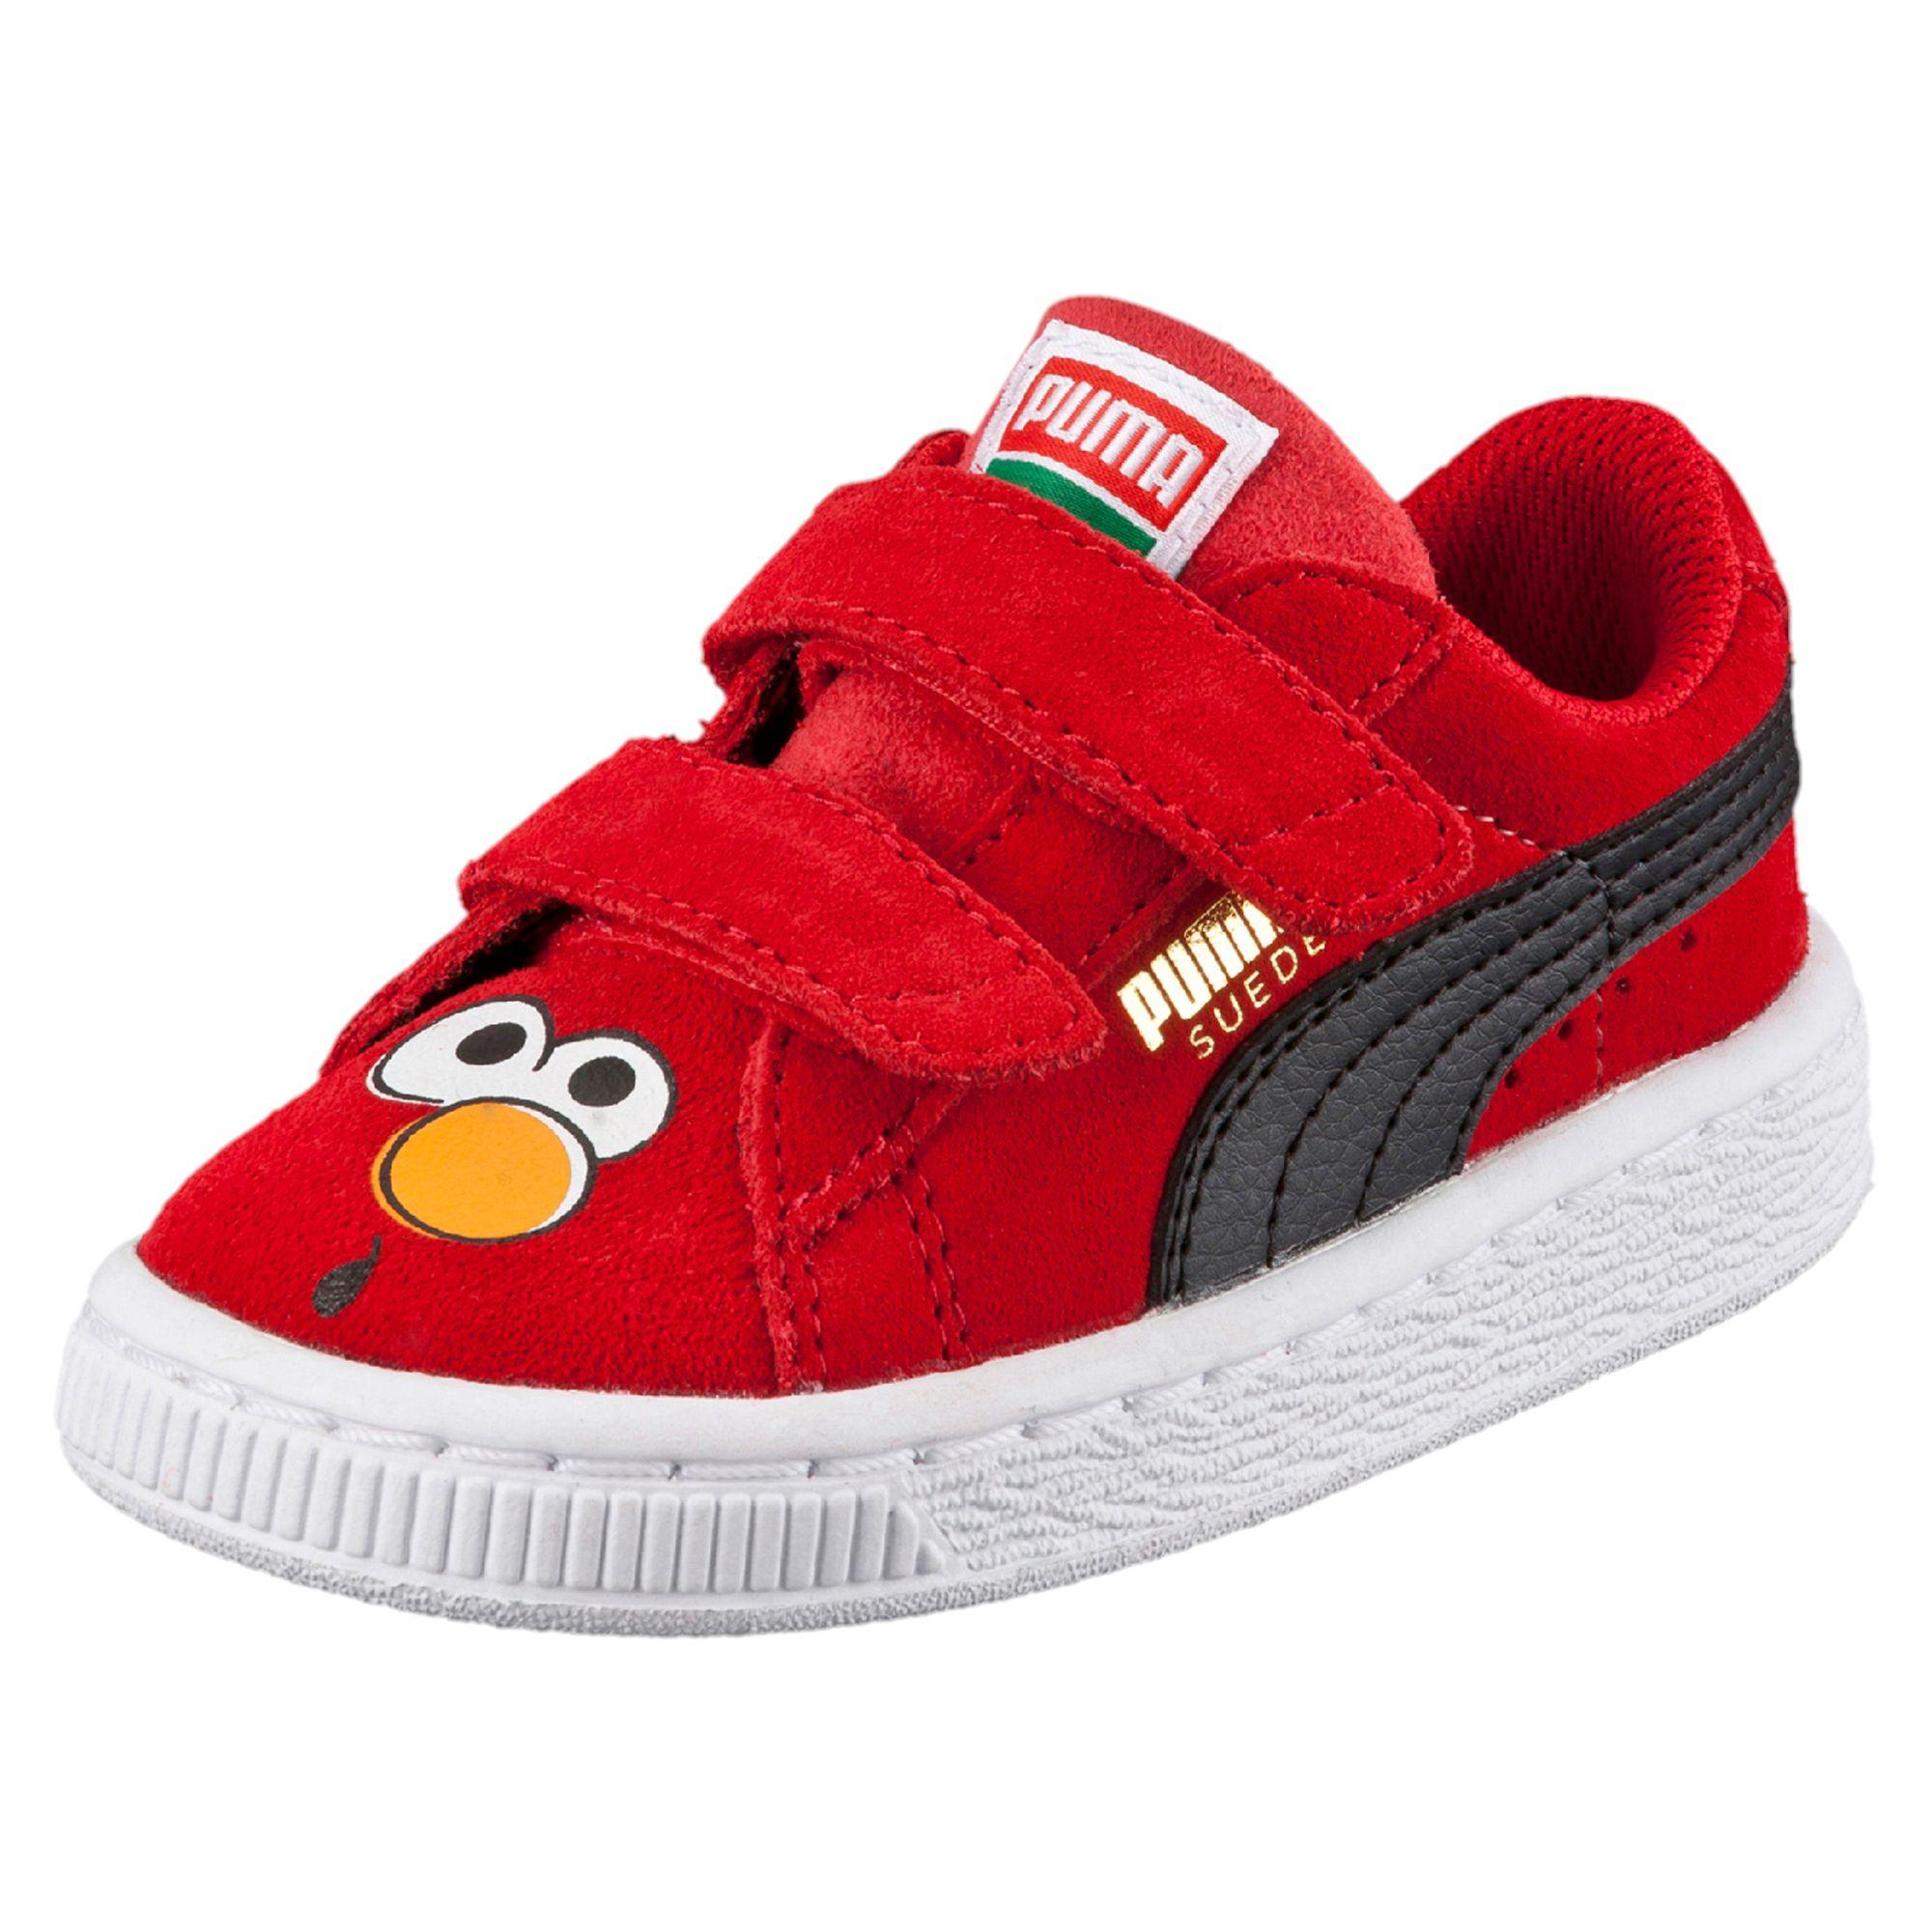 puma baby shoes australia